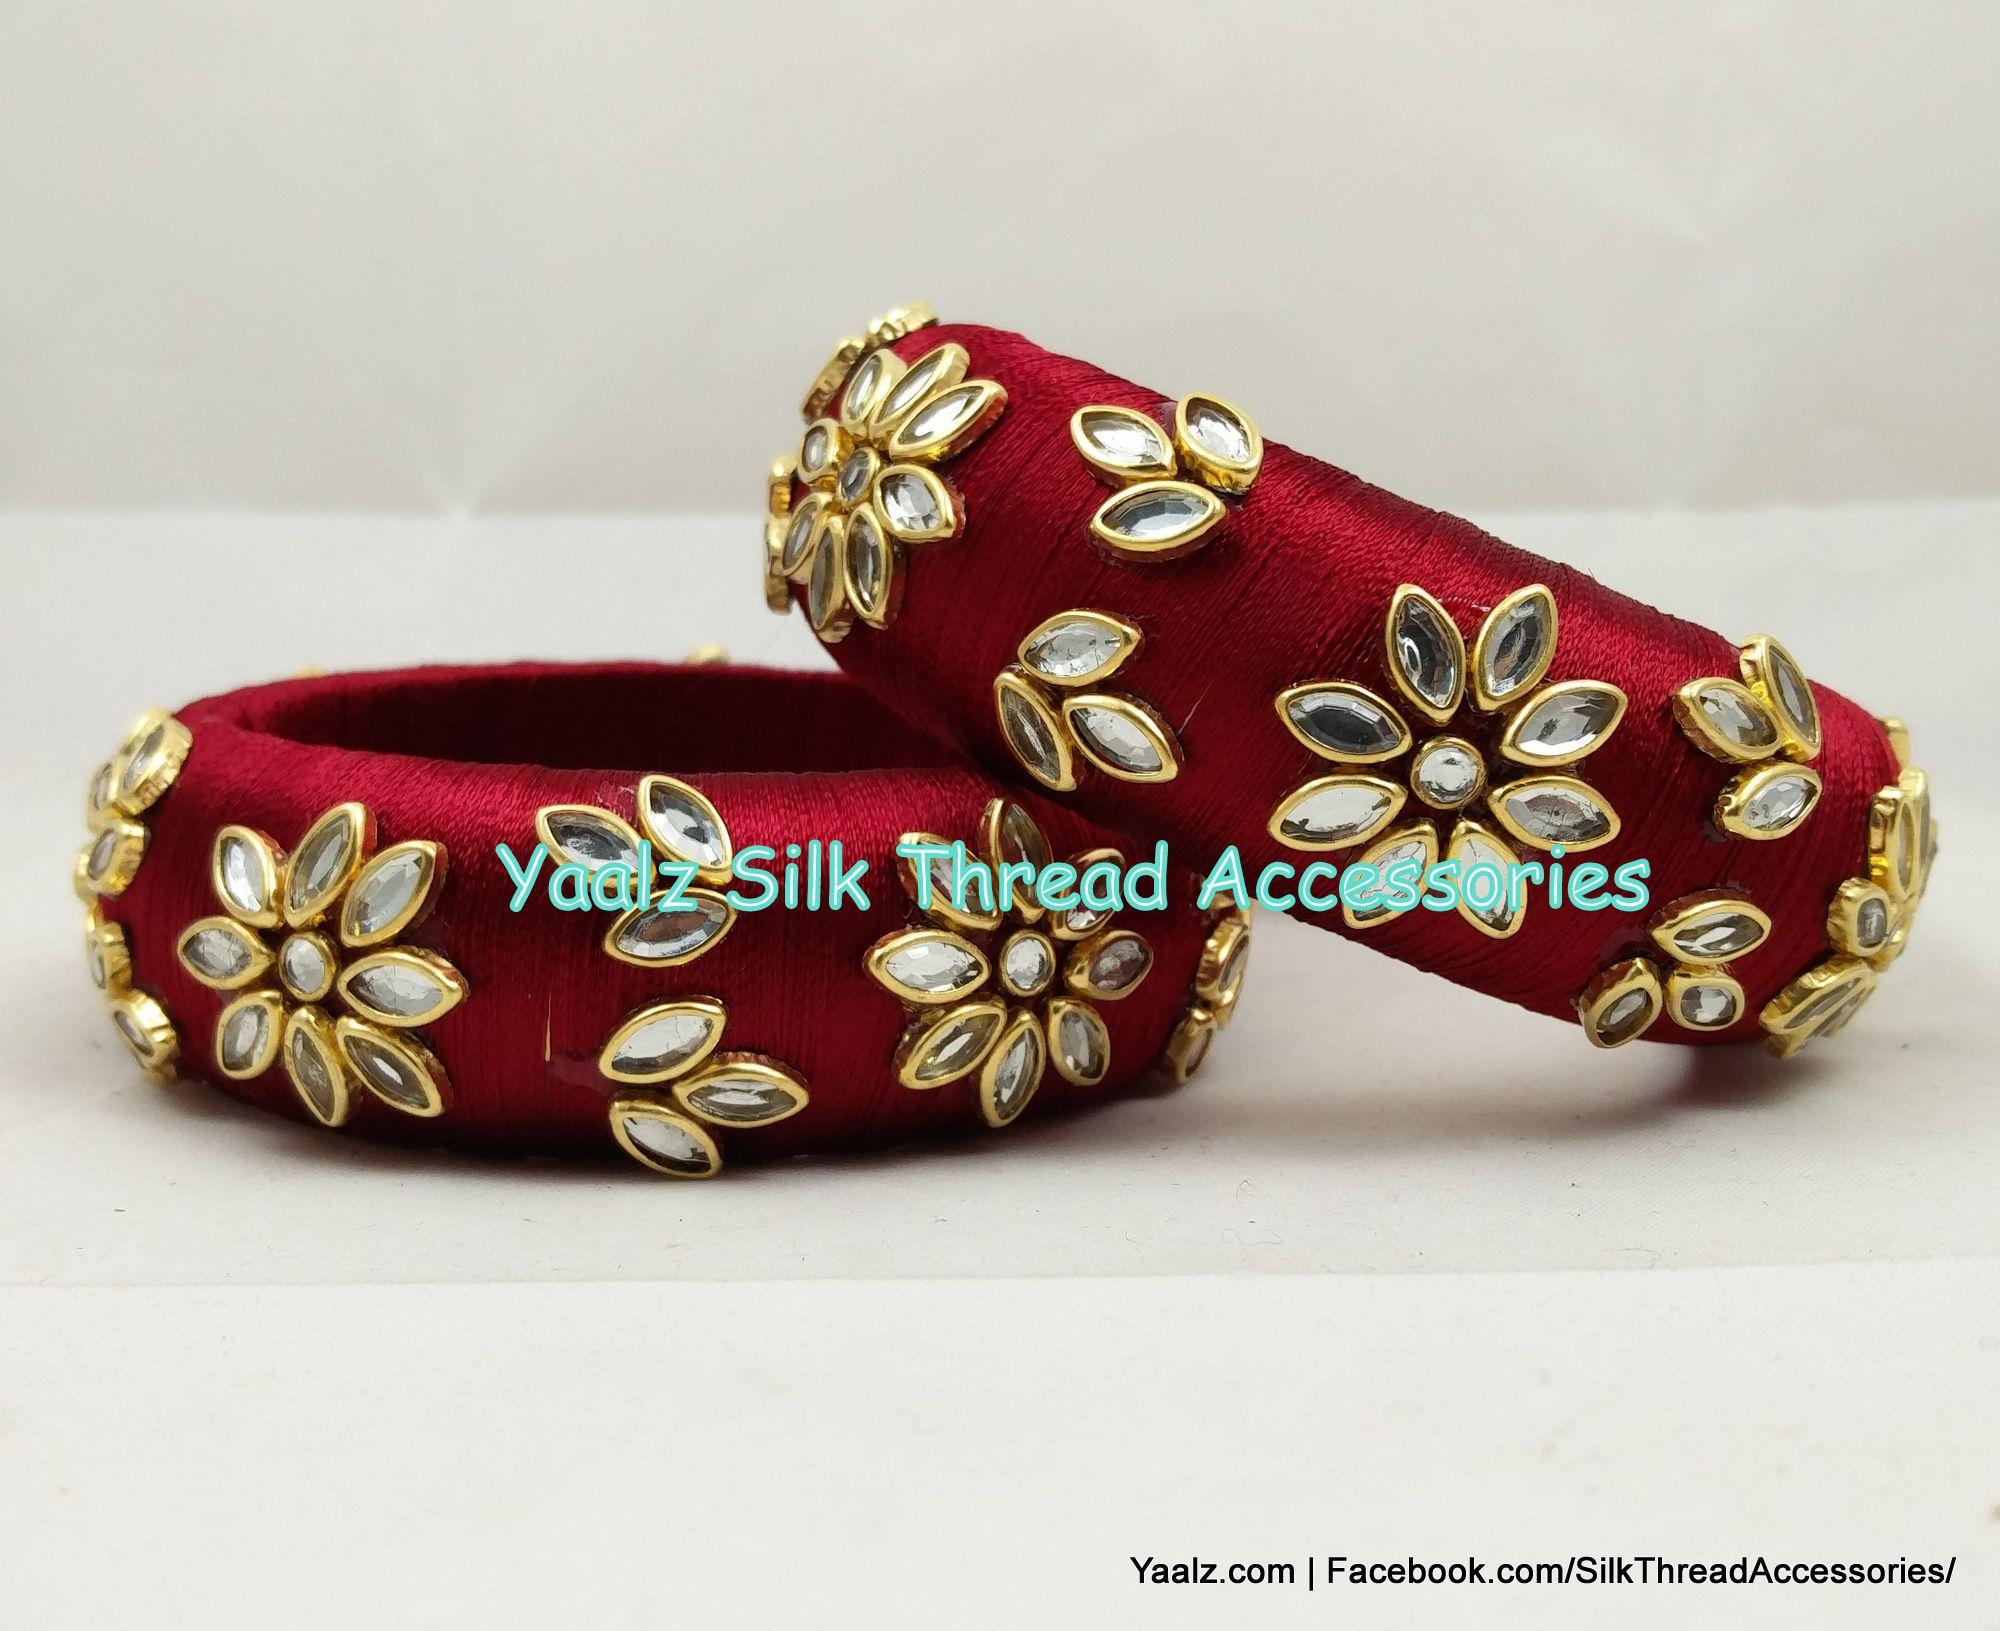 4d31efc13fdd7 Yaalz Kundan Stone Bangle Kada Pair In Maroon Color !! Price Rs.550 ...